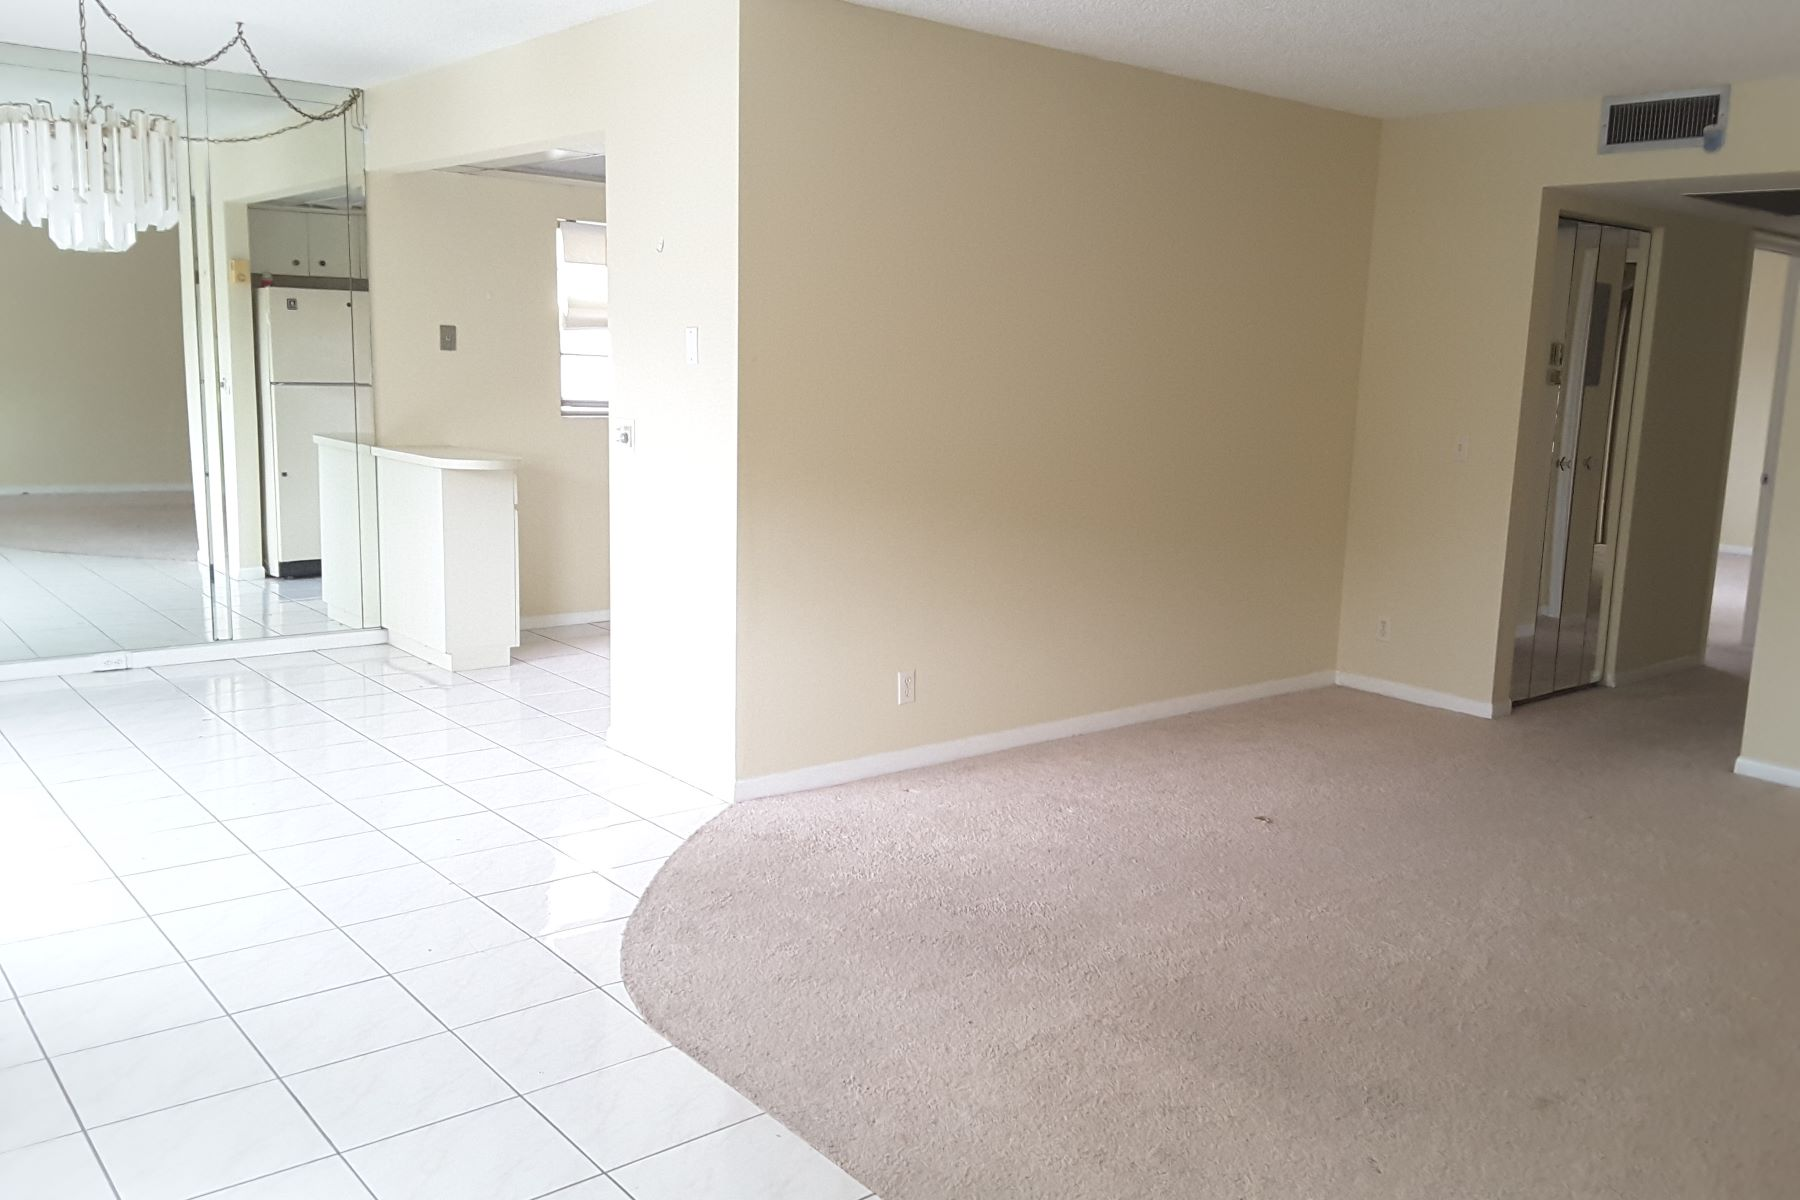 Condomínio para Venda às 800 SW 131 AVE # 201F Pembroke Pines, Florida, 33027 Estados Unidos